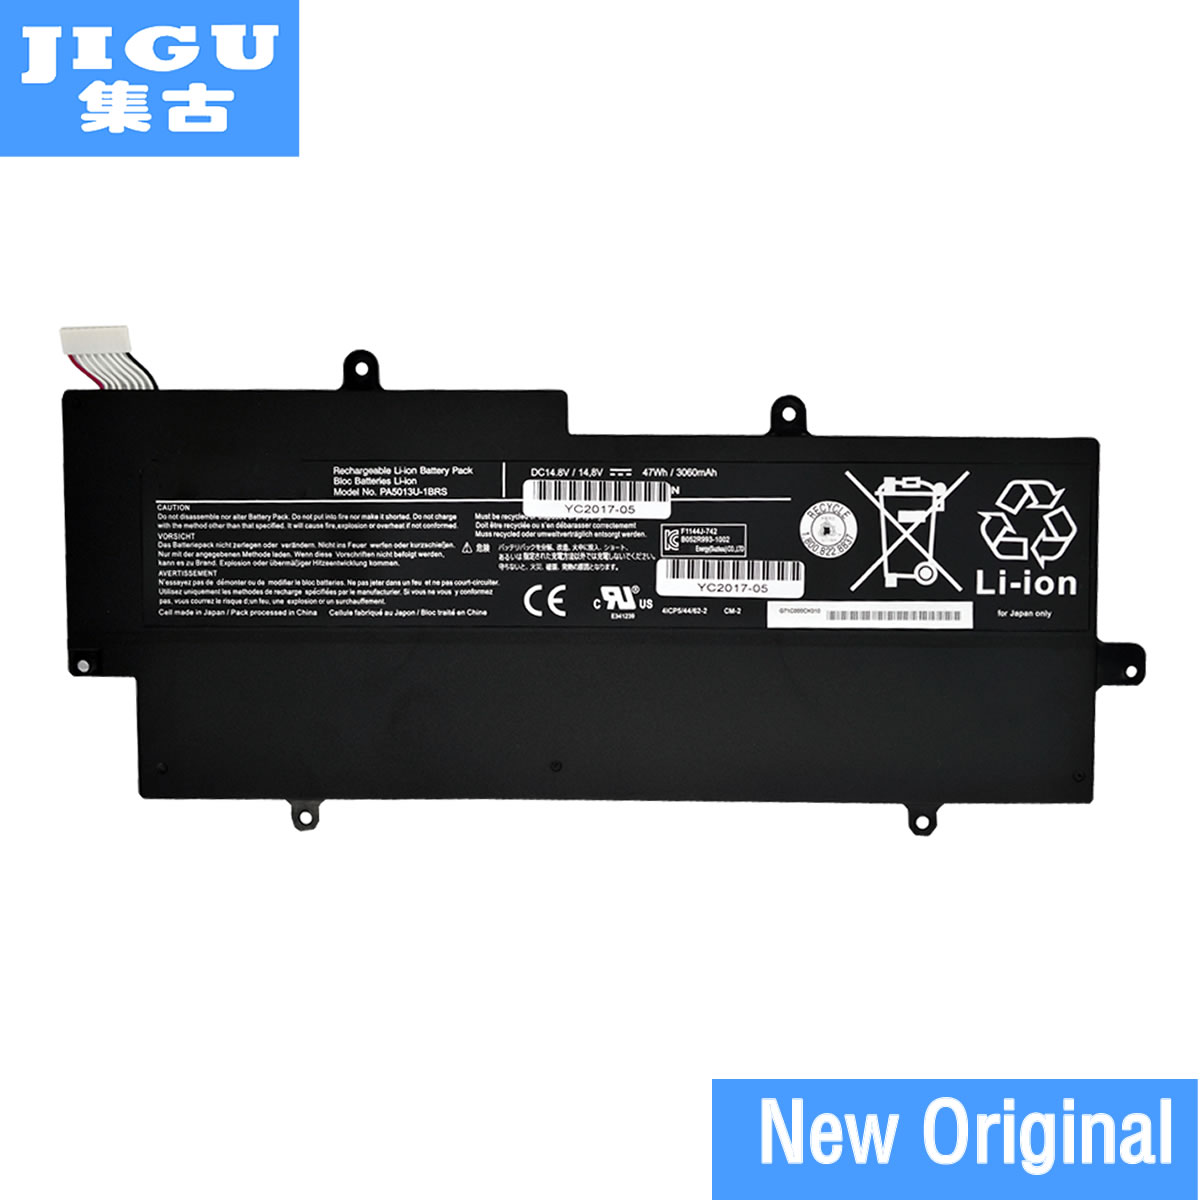 JIGU Batterie D'ordinateur Portable PA5013U-1BRS POUR TOSHIBA Pour Portege Z830 Z835 Série Z930 Z935 Z930-K01S Z930-K08S